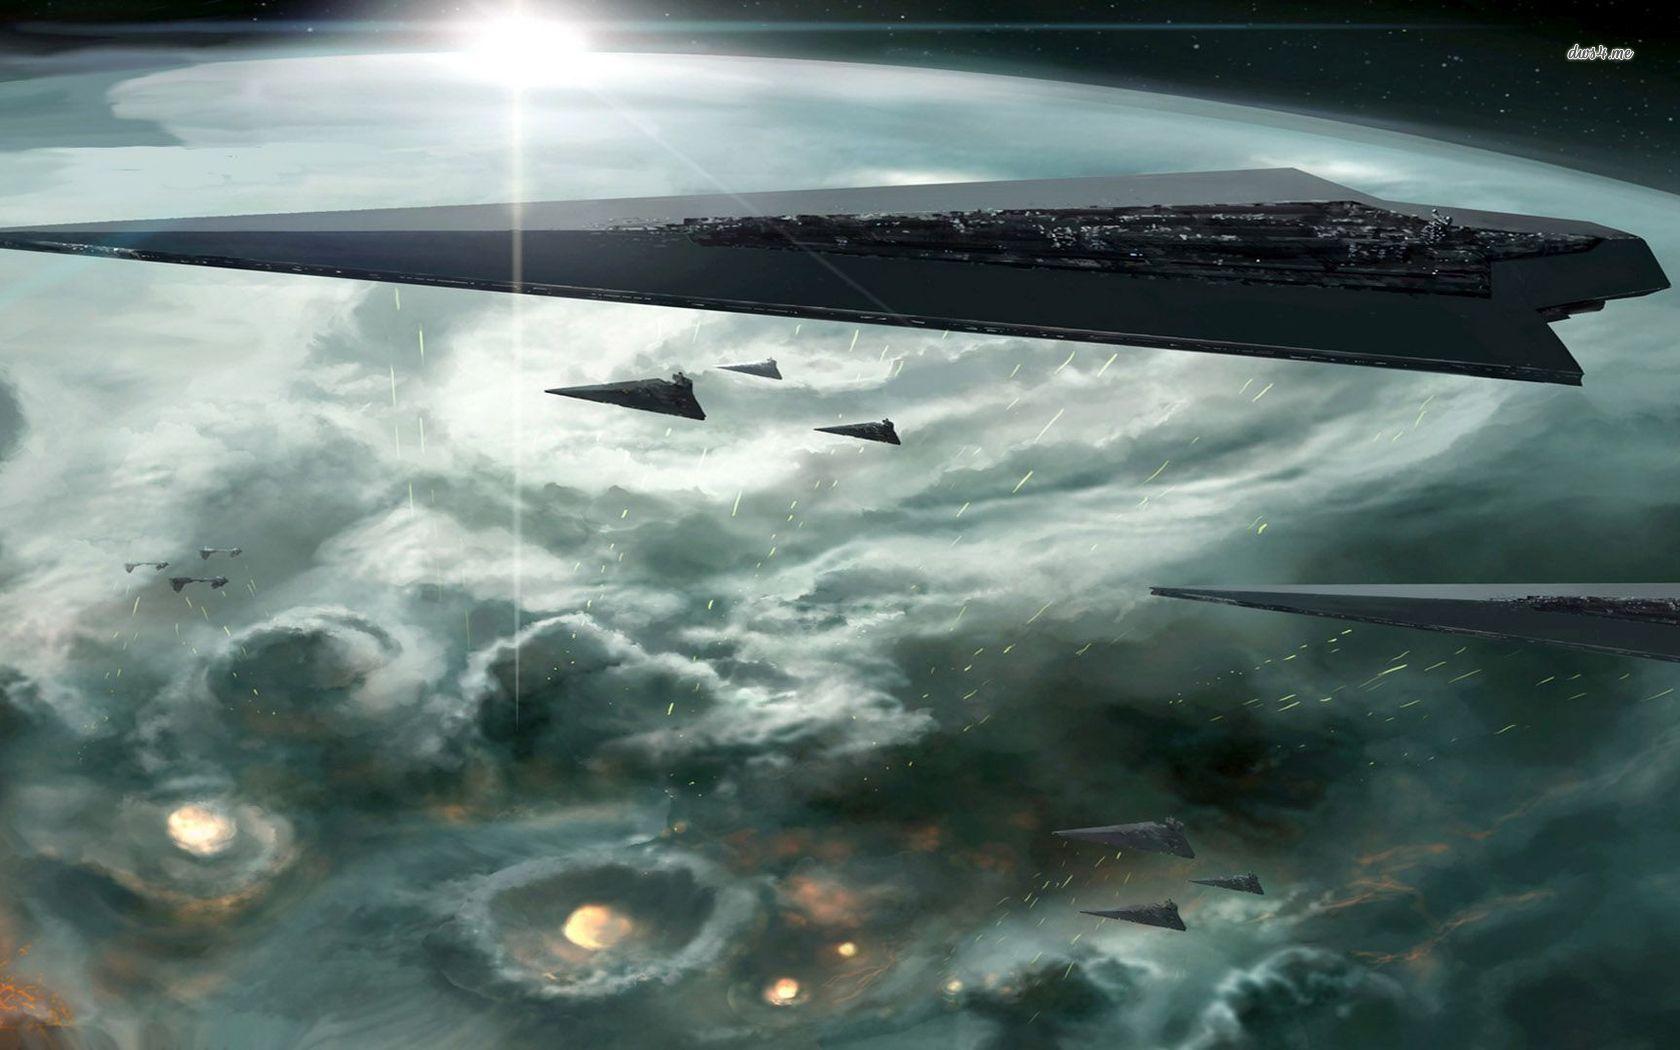 49 Star Wars Star Destroyer Wallpaper On Wallpapersafari